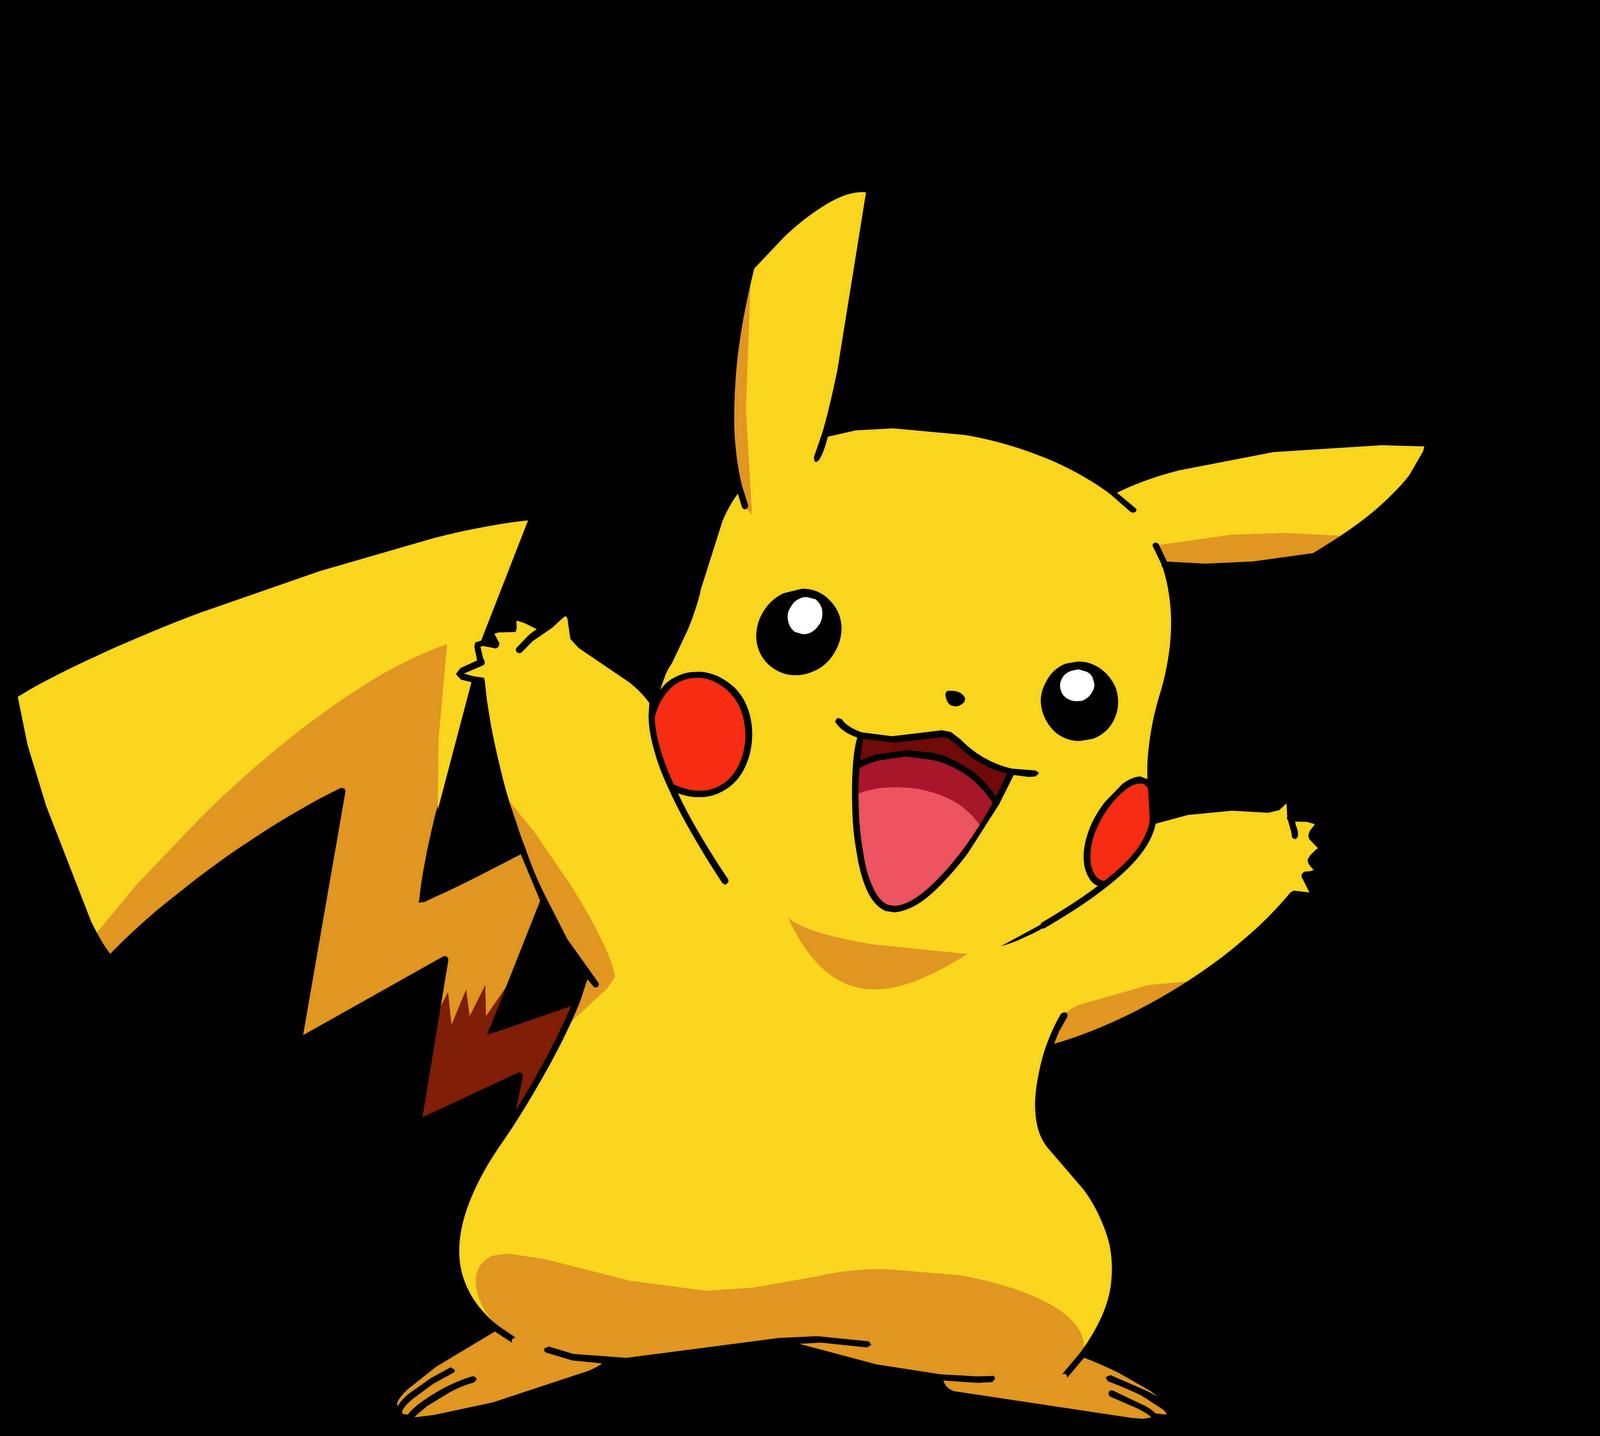 Pokeball clipart gambar. The pokemon go on